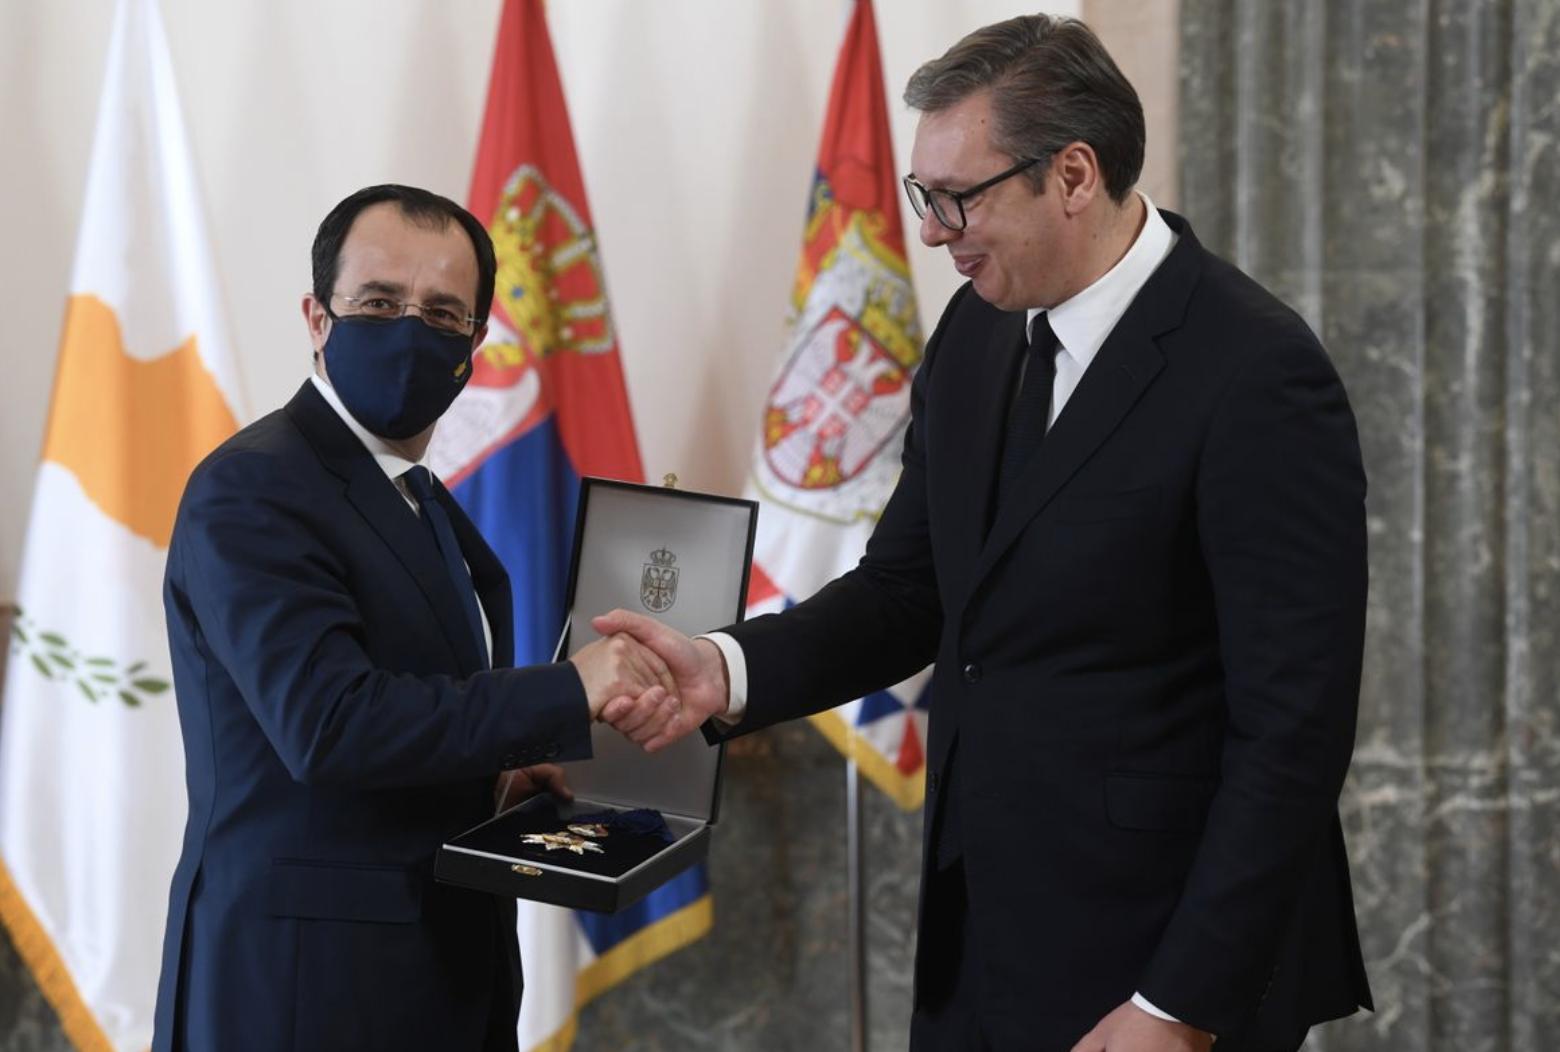 Serbia: President Vučič presents Christodoulides with Order of the Serbian Flag